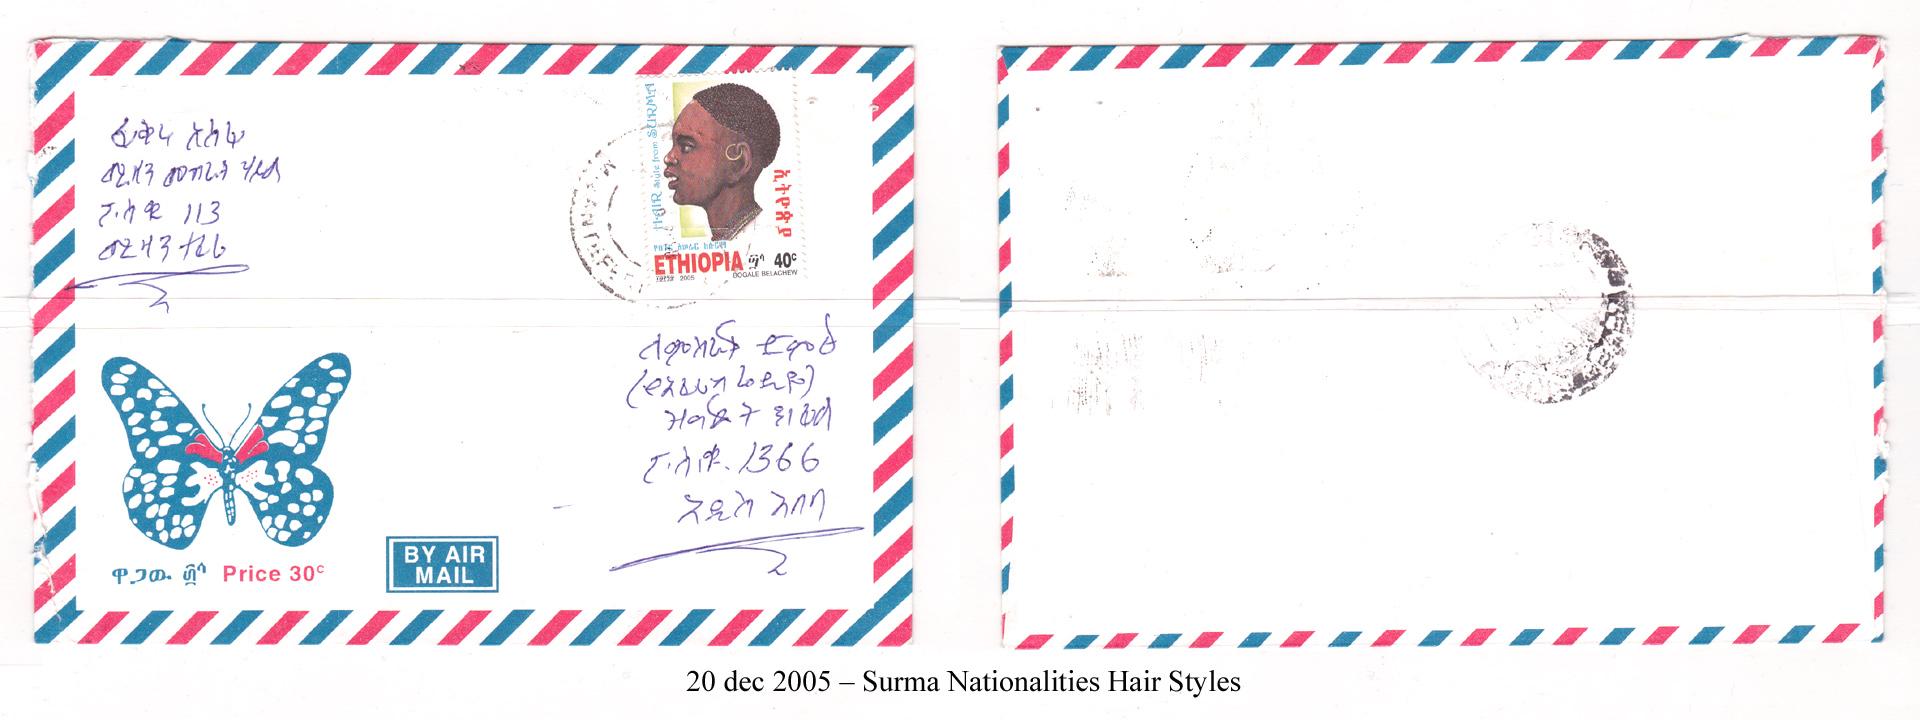 20051220 - Surma Nationalities Hair Styles